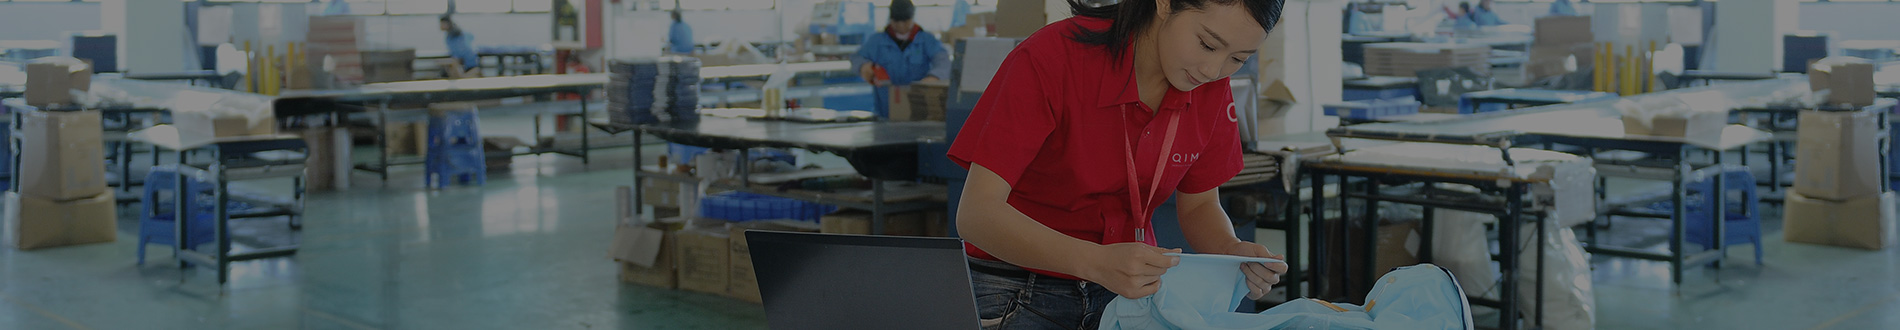 Apparel & Garment Quality Control Testing | Textile Testing Labs